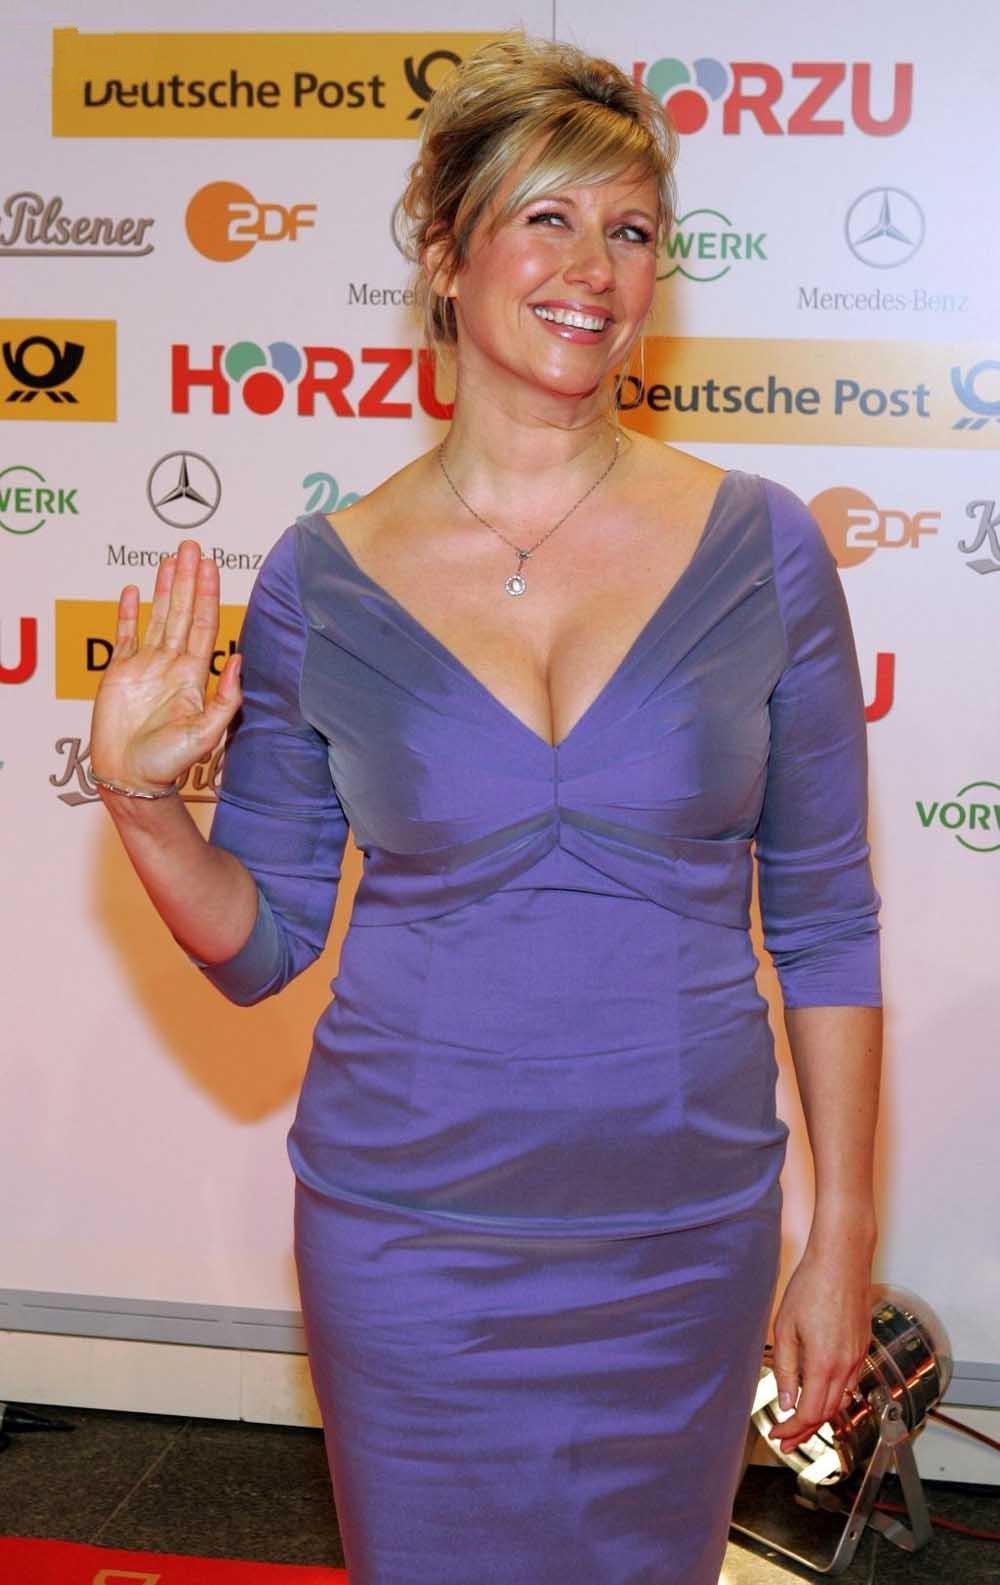 Andrea Kiewel Nude » SexyStars.online - Hottest Celebrity